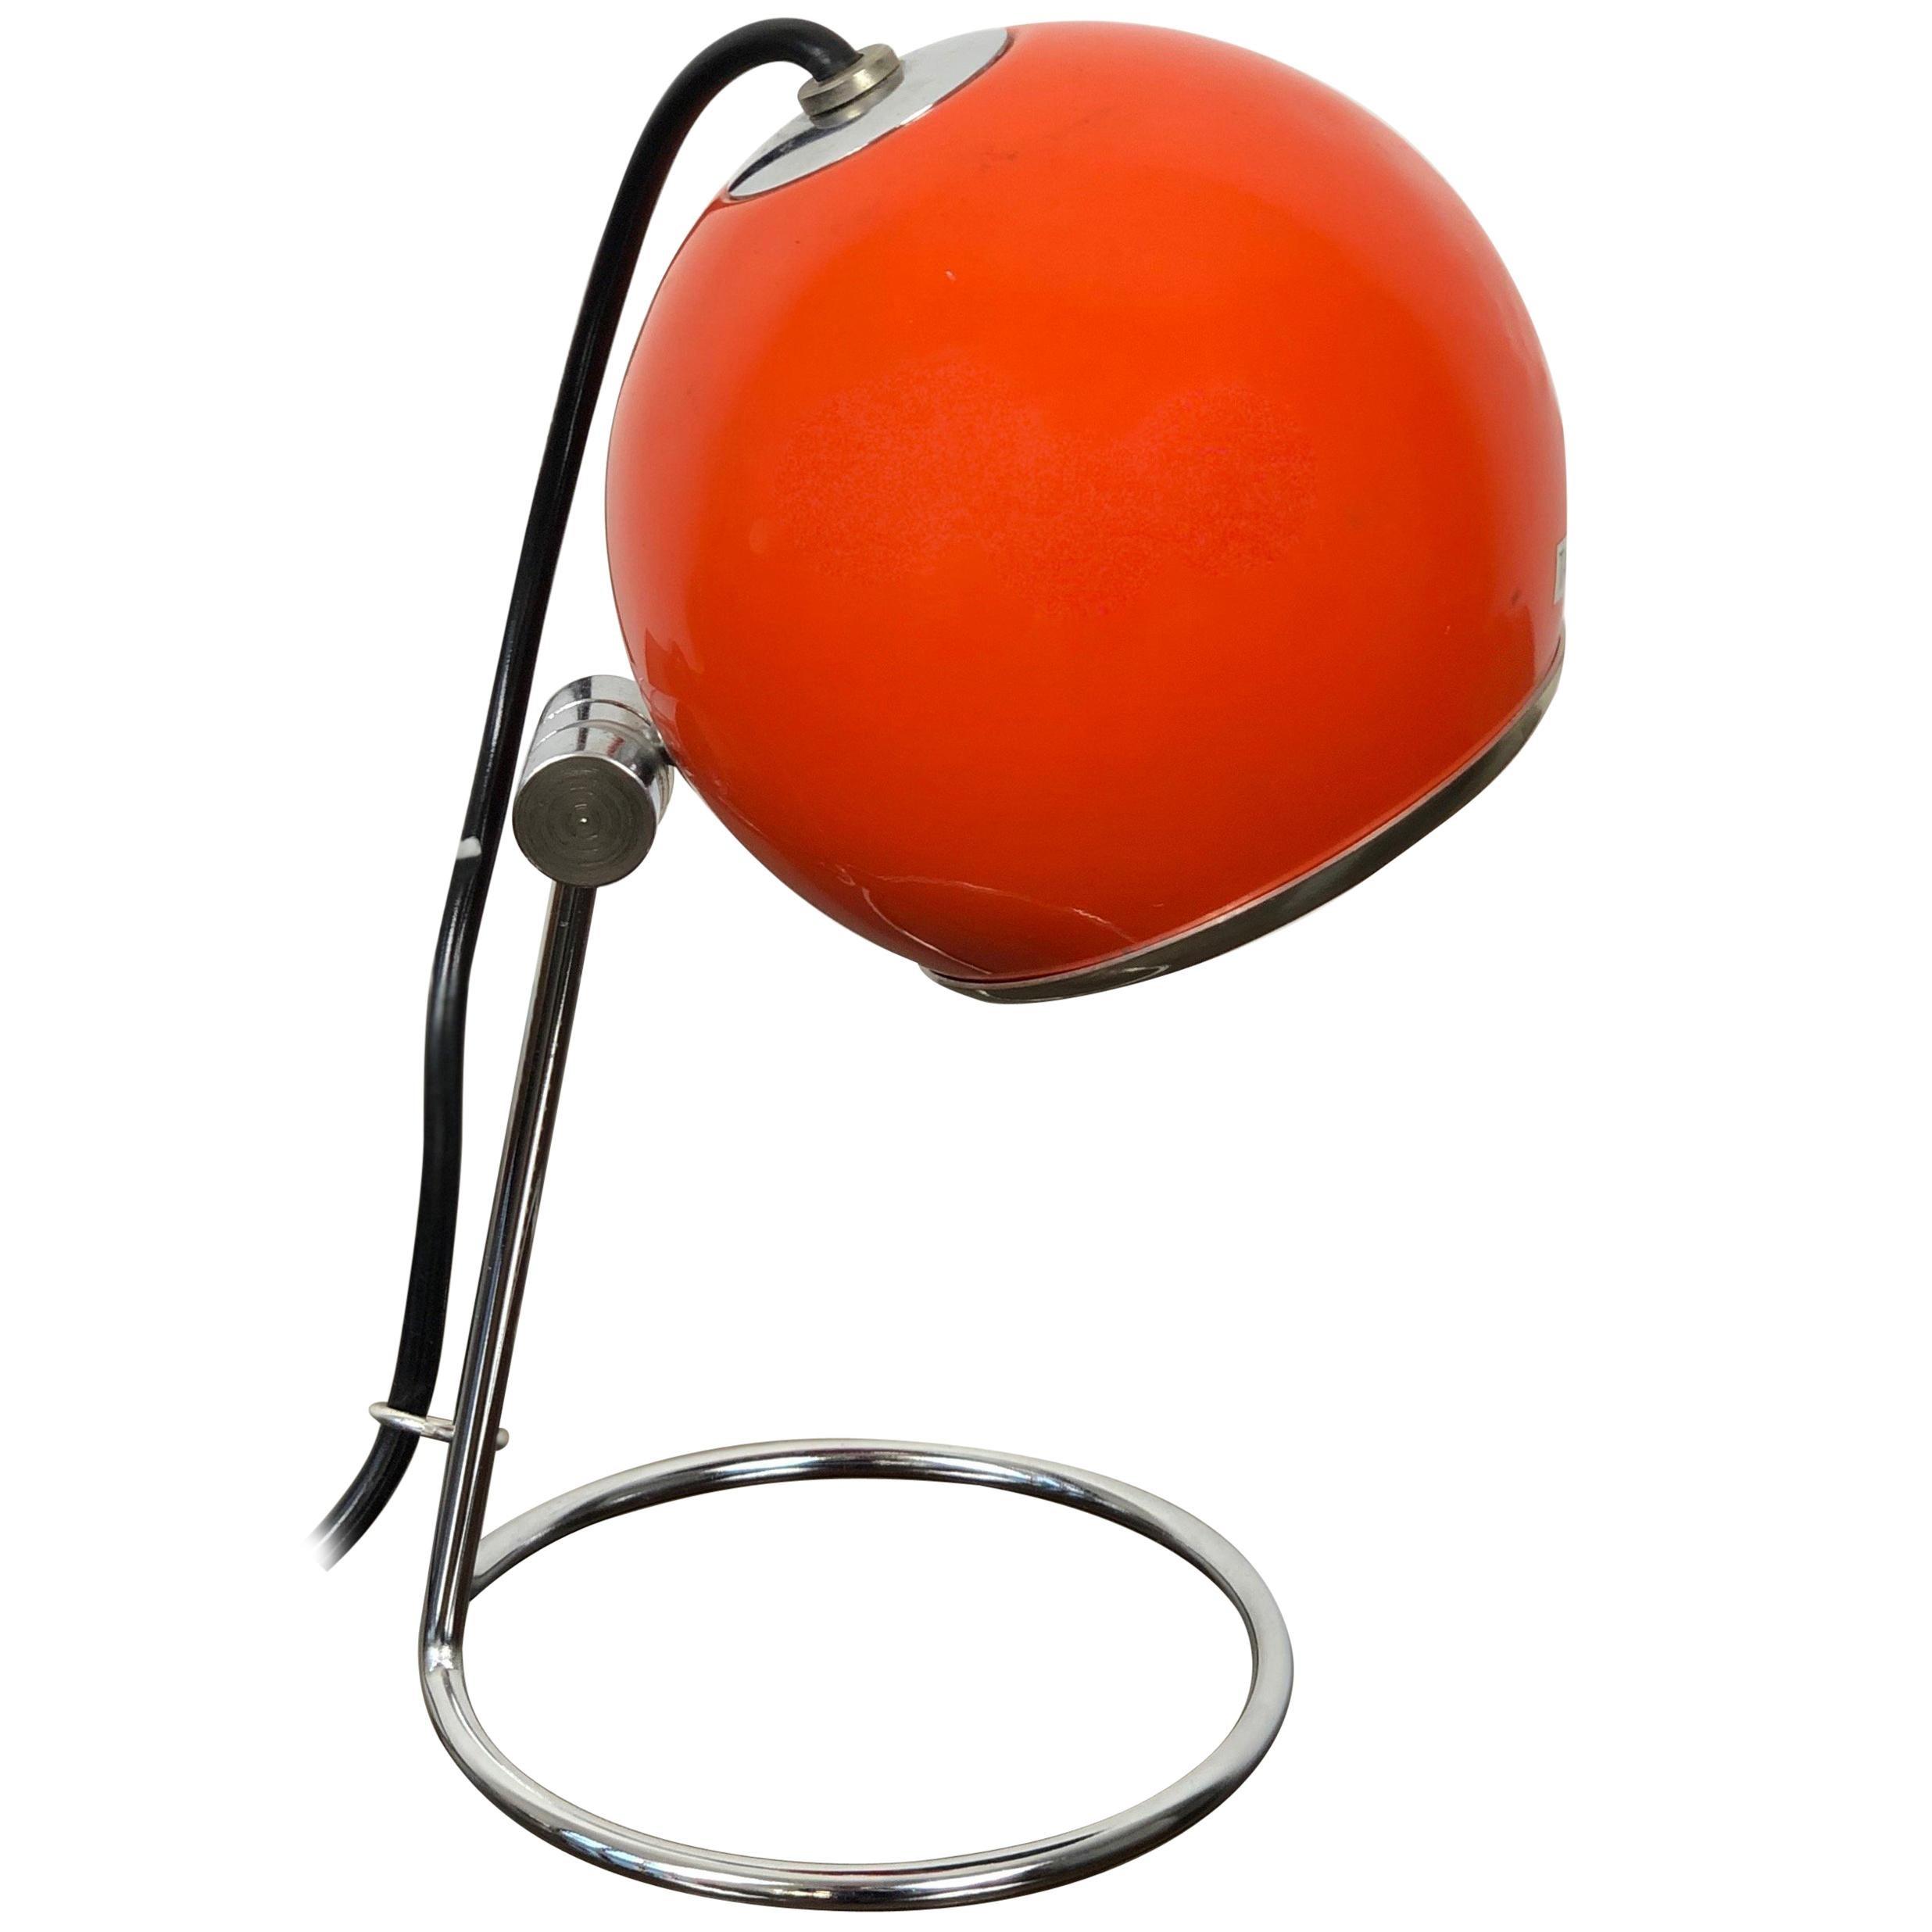 Targetti Sankey Orange Table Lamp, Italy, 1970s